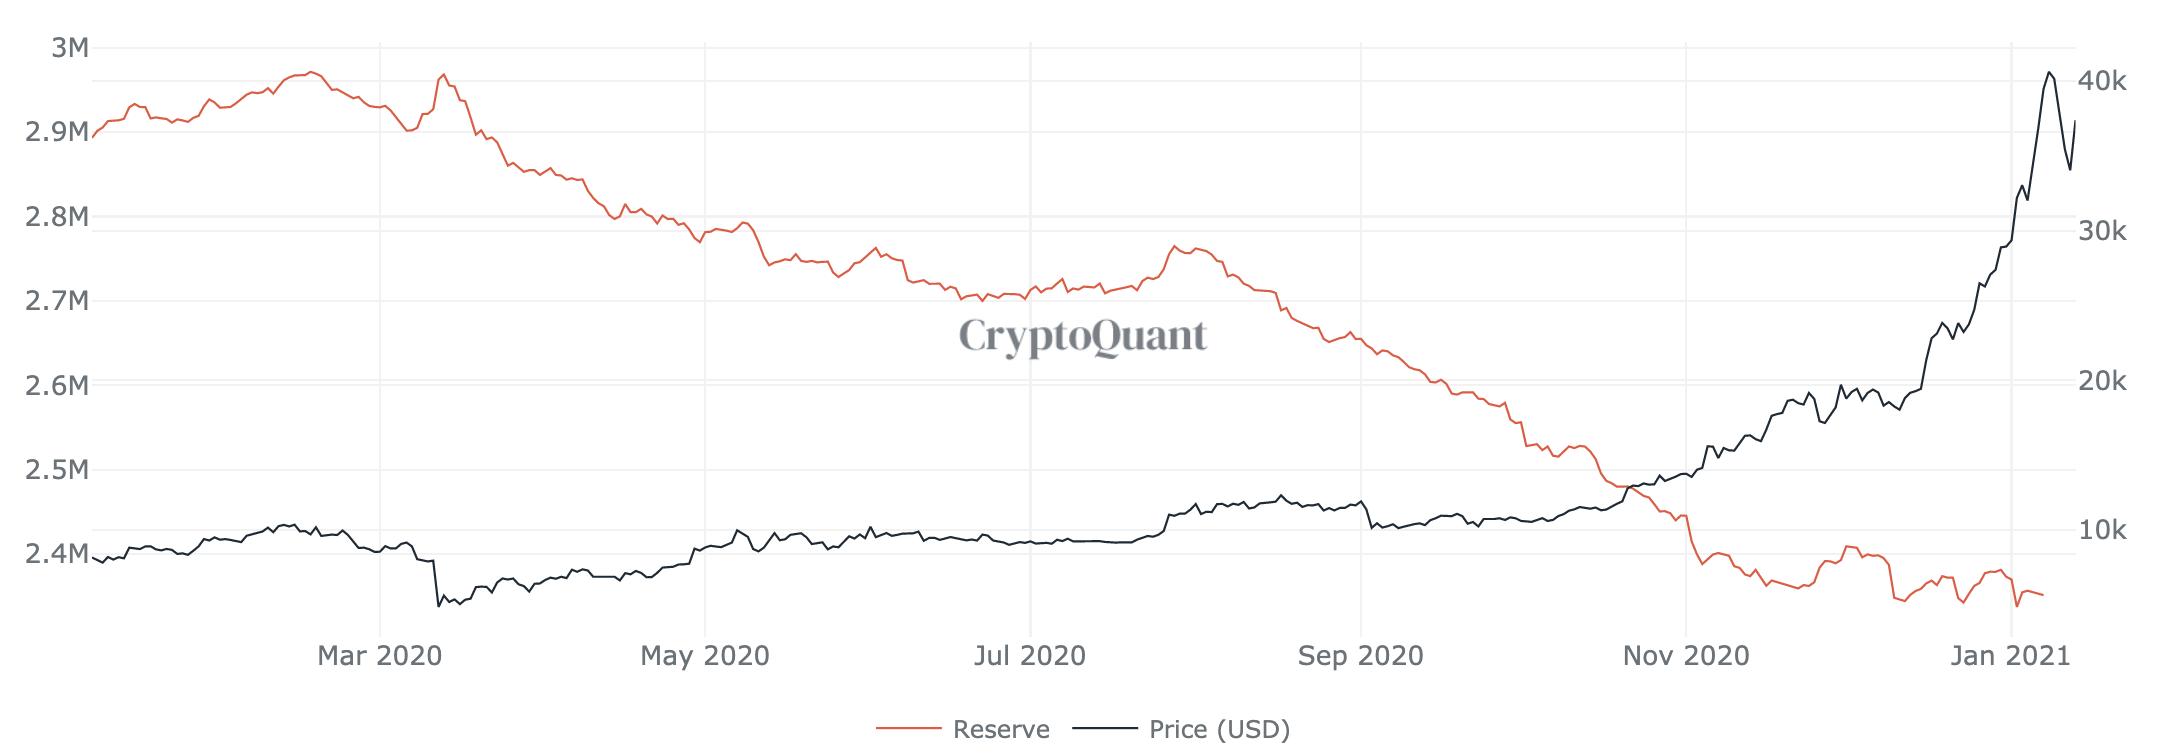 Bitcoin on exchanges, Jan 2021